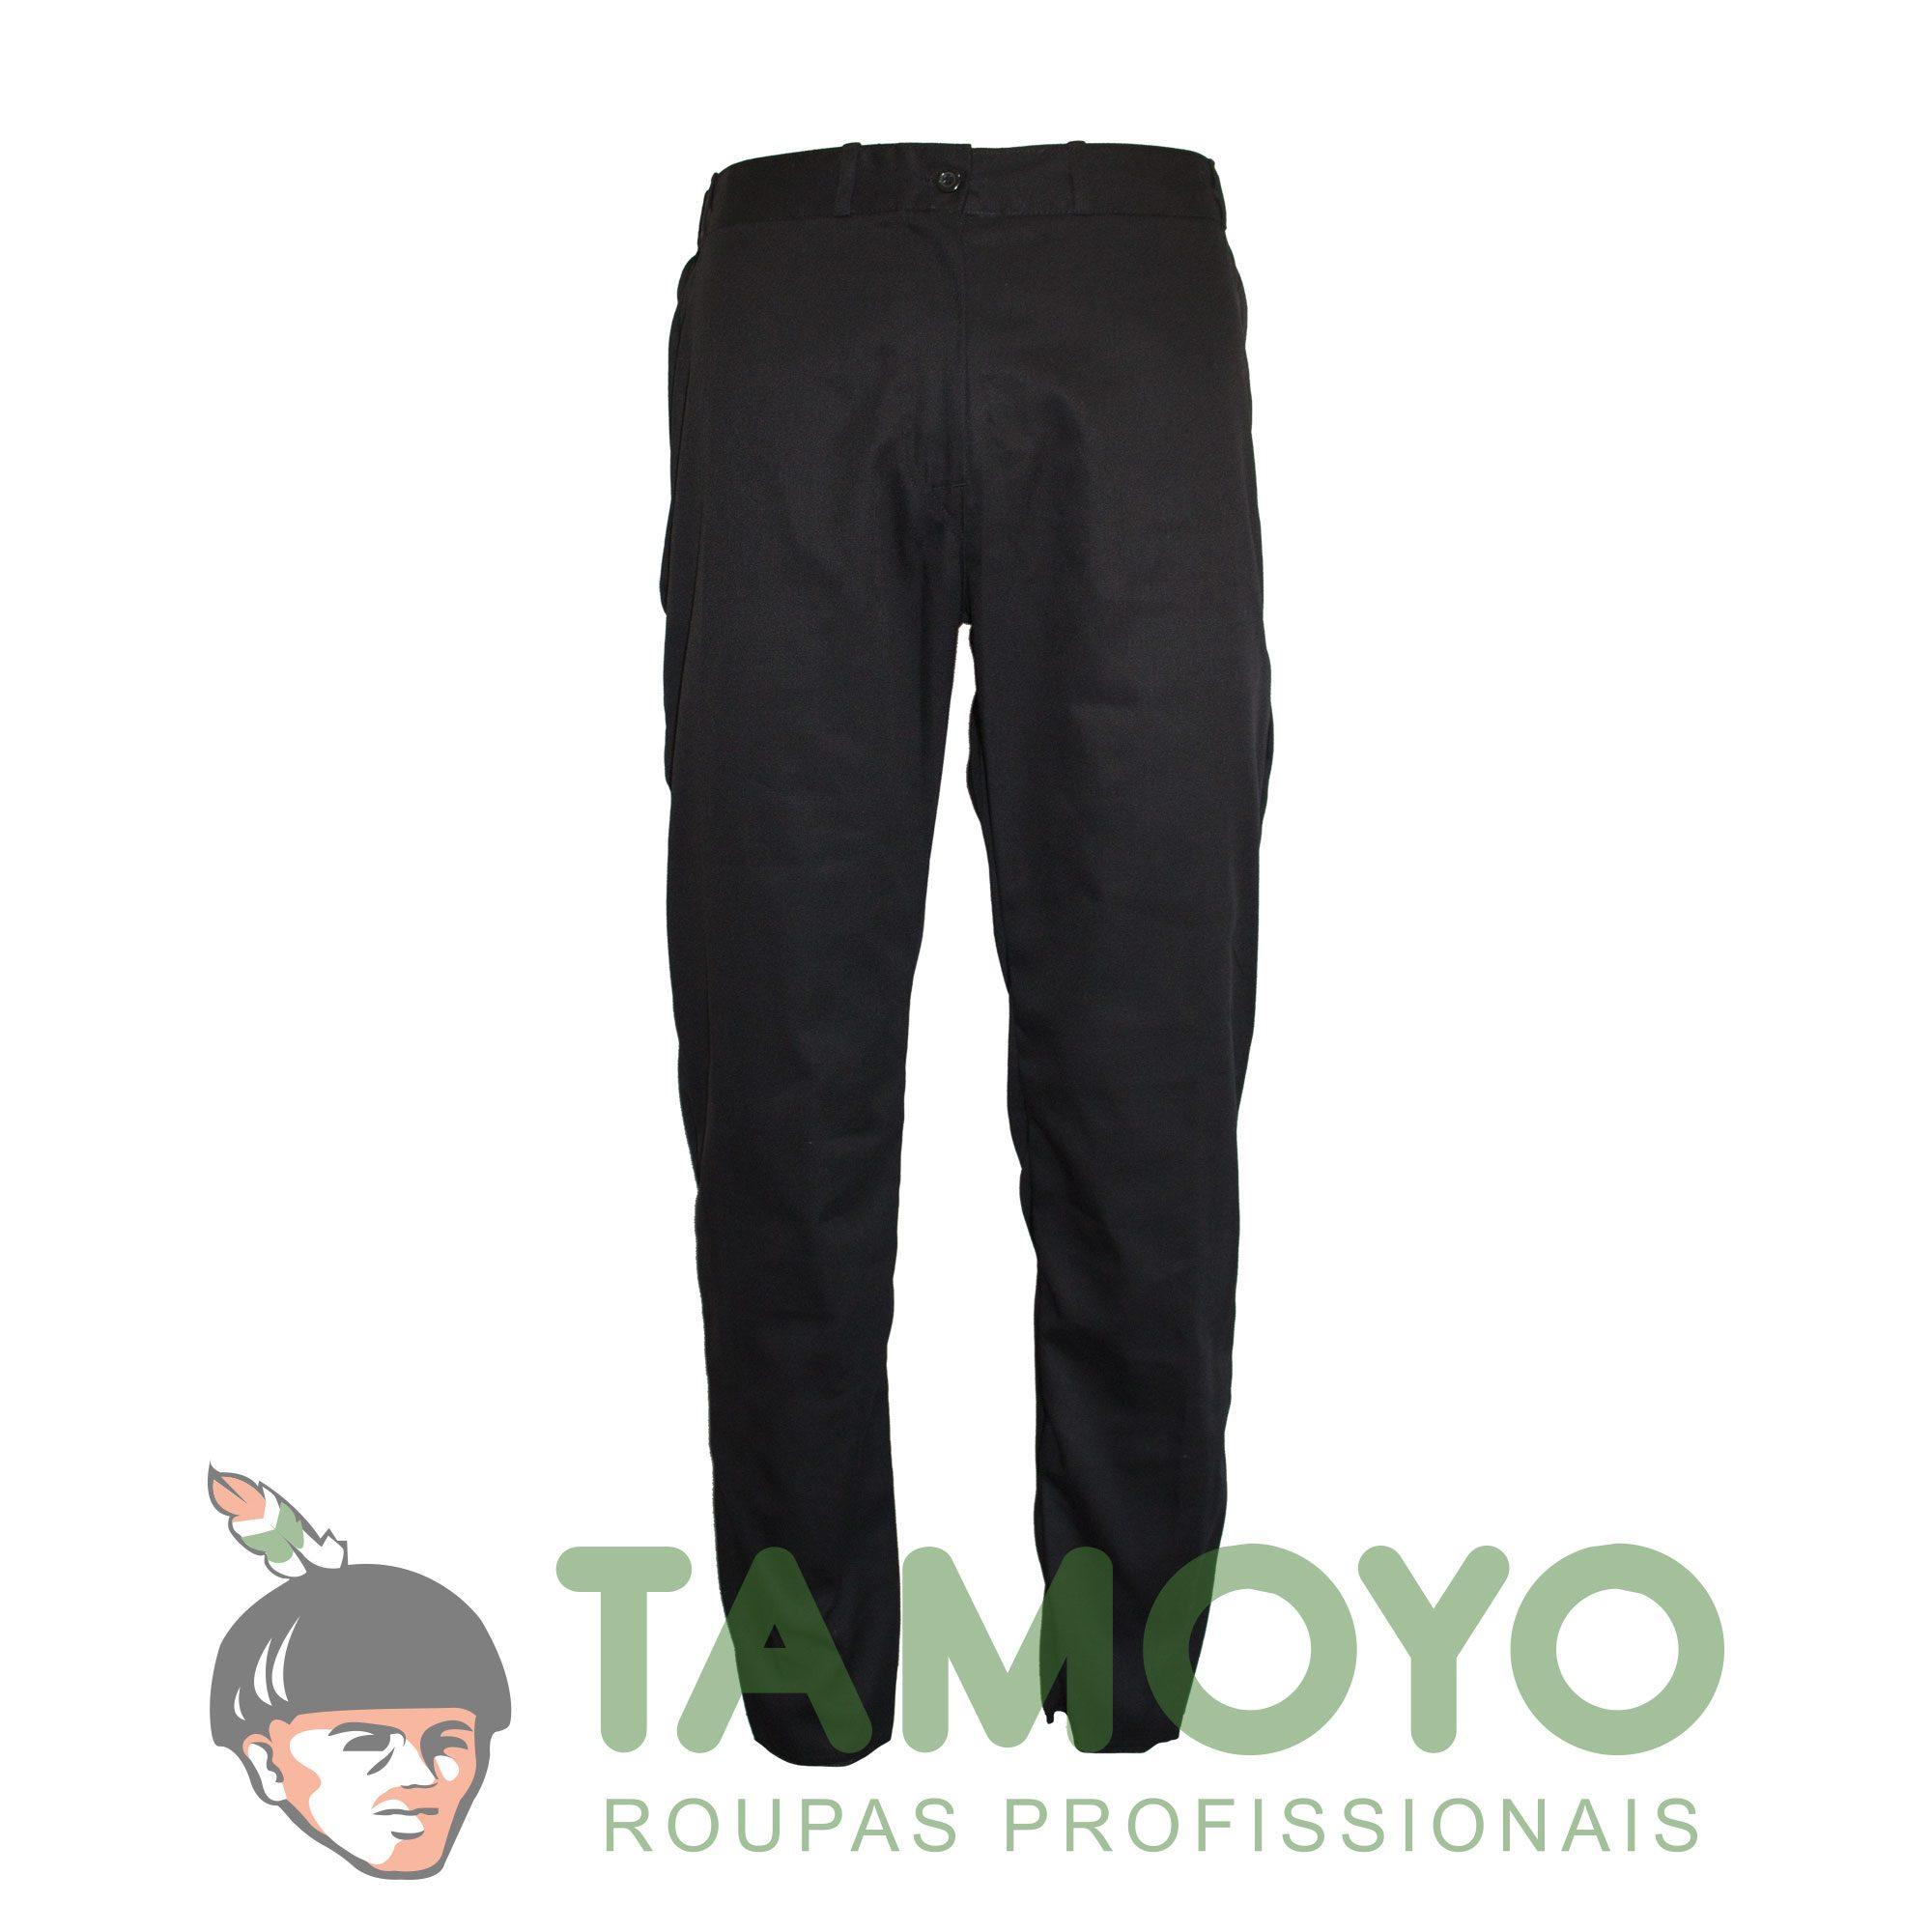 calca-atendente-masculina-roupas-tamoyo-uniformes-profissionais-f